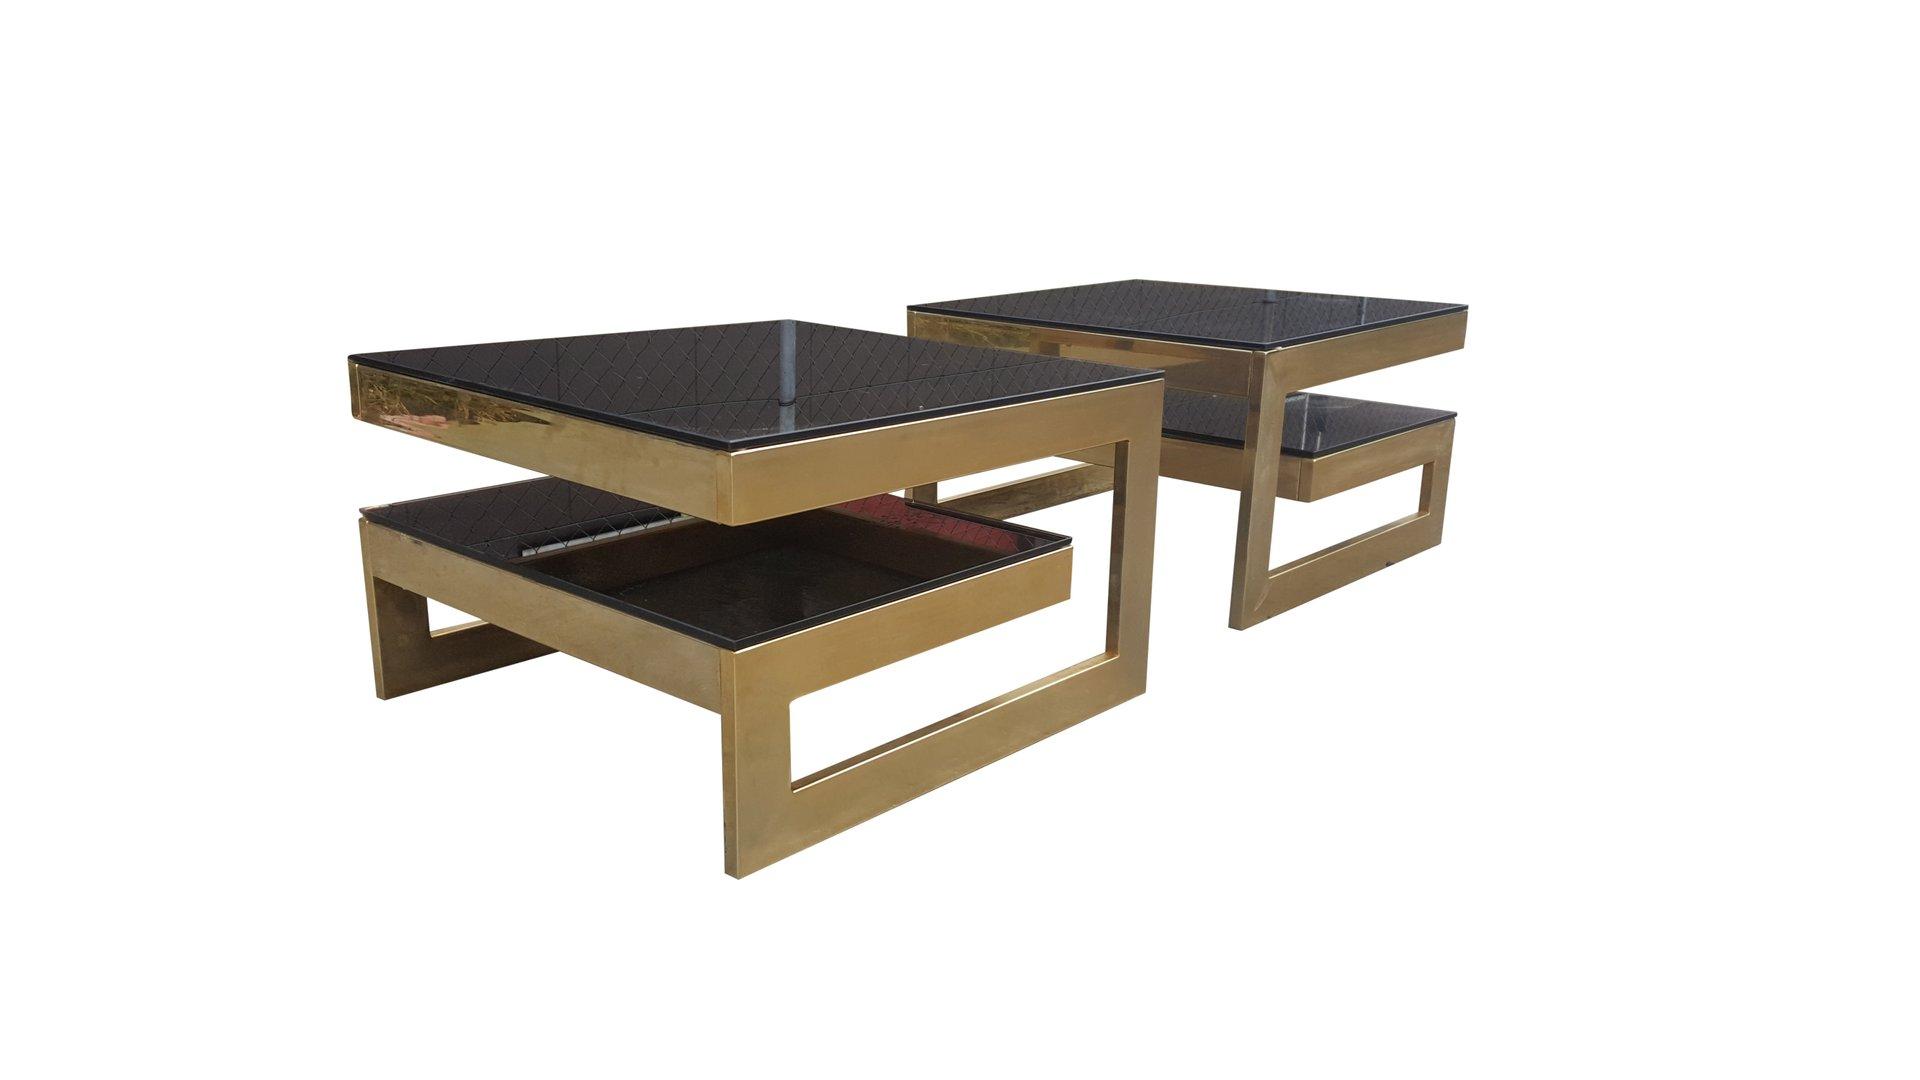 MidCentury Modern Karat Gold GSide Tables By Belgo Chrom Set - Mid century modern picnic table